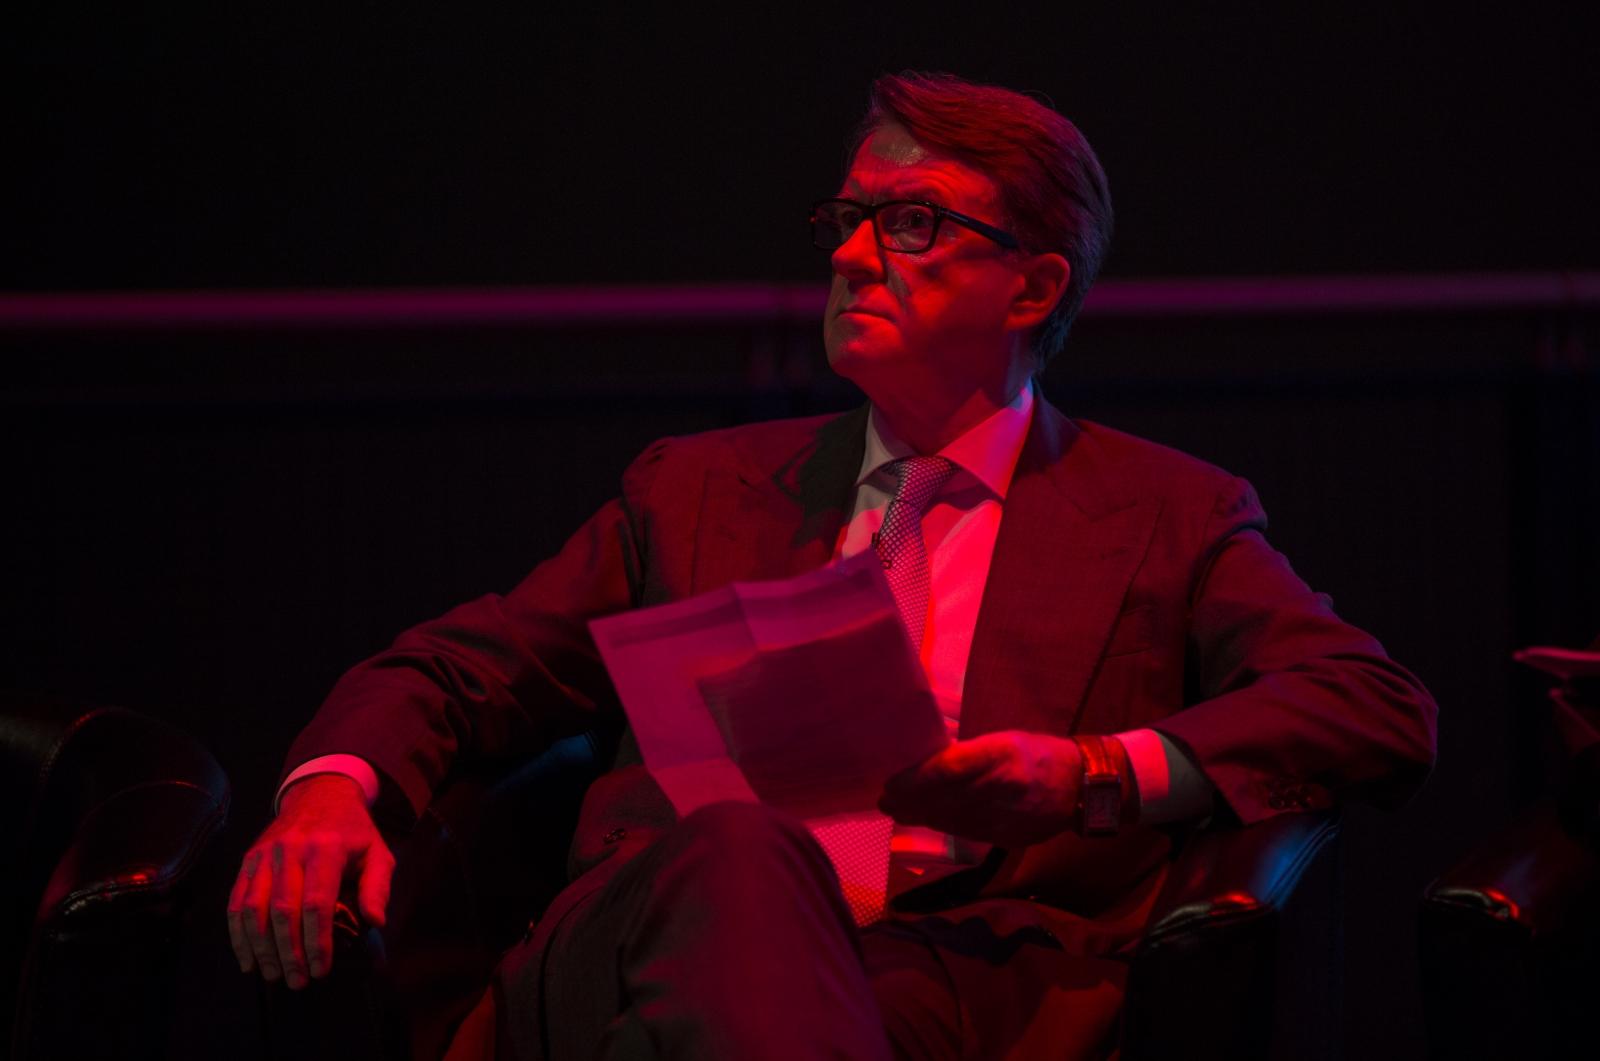 Peter Mandelson attacks Jeremy Corbyn